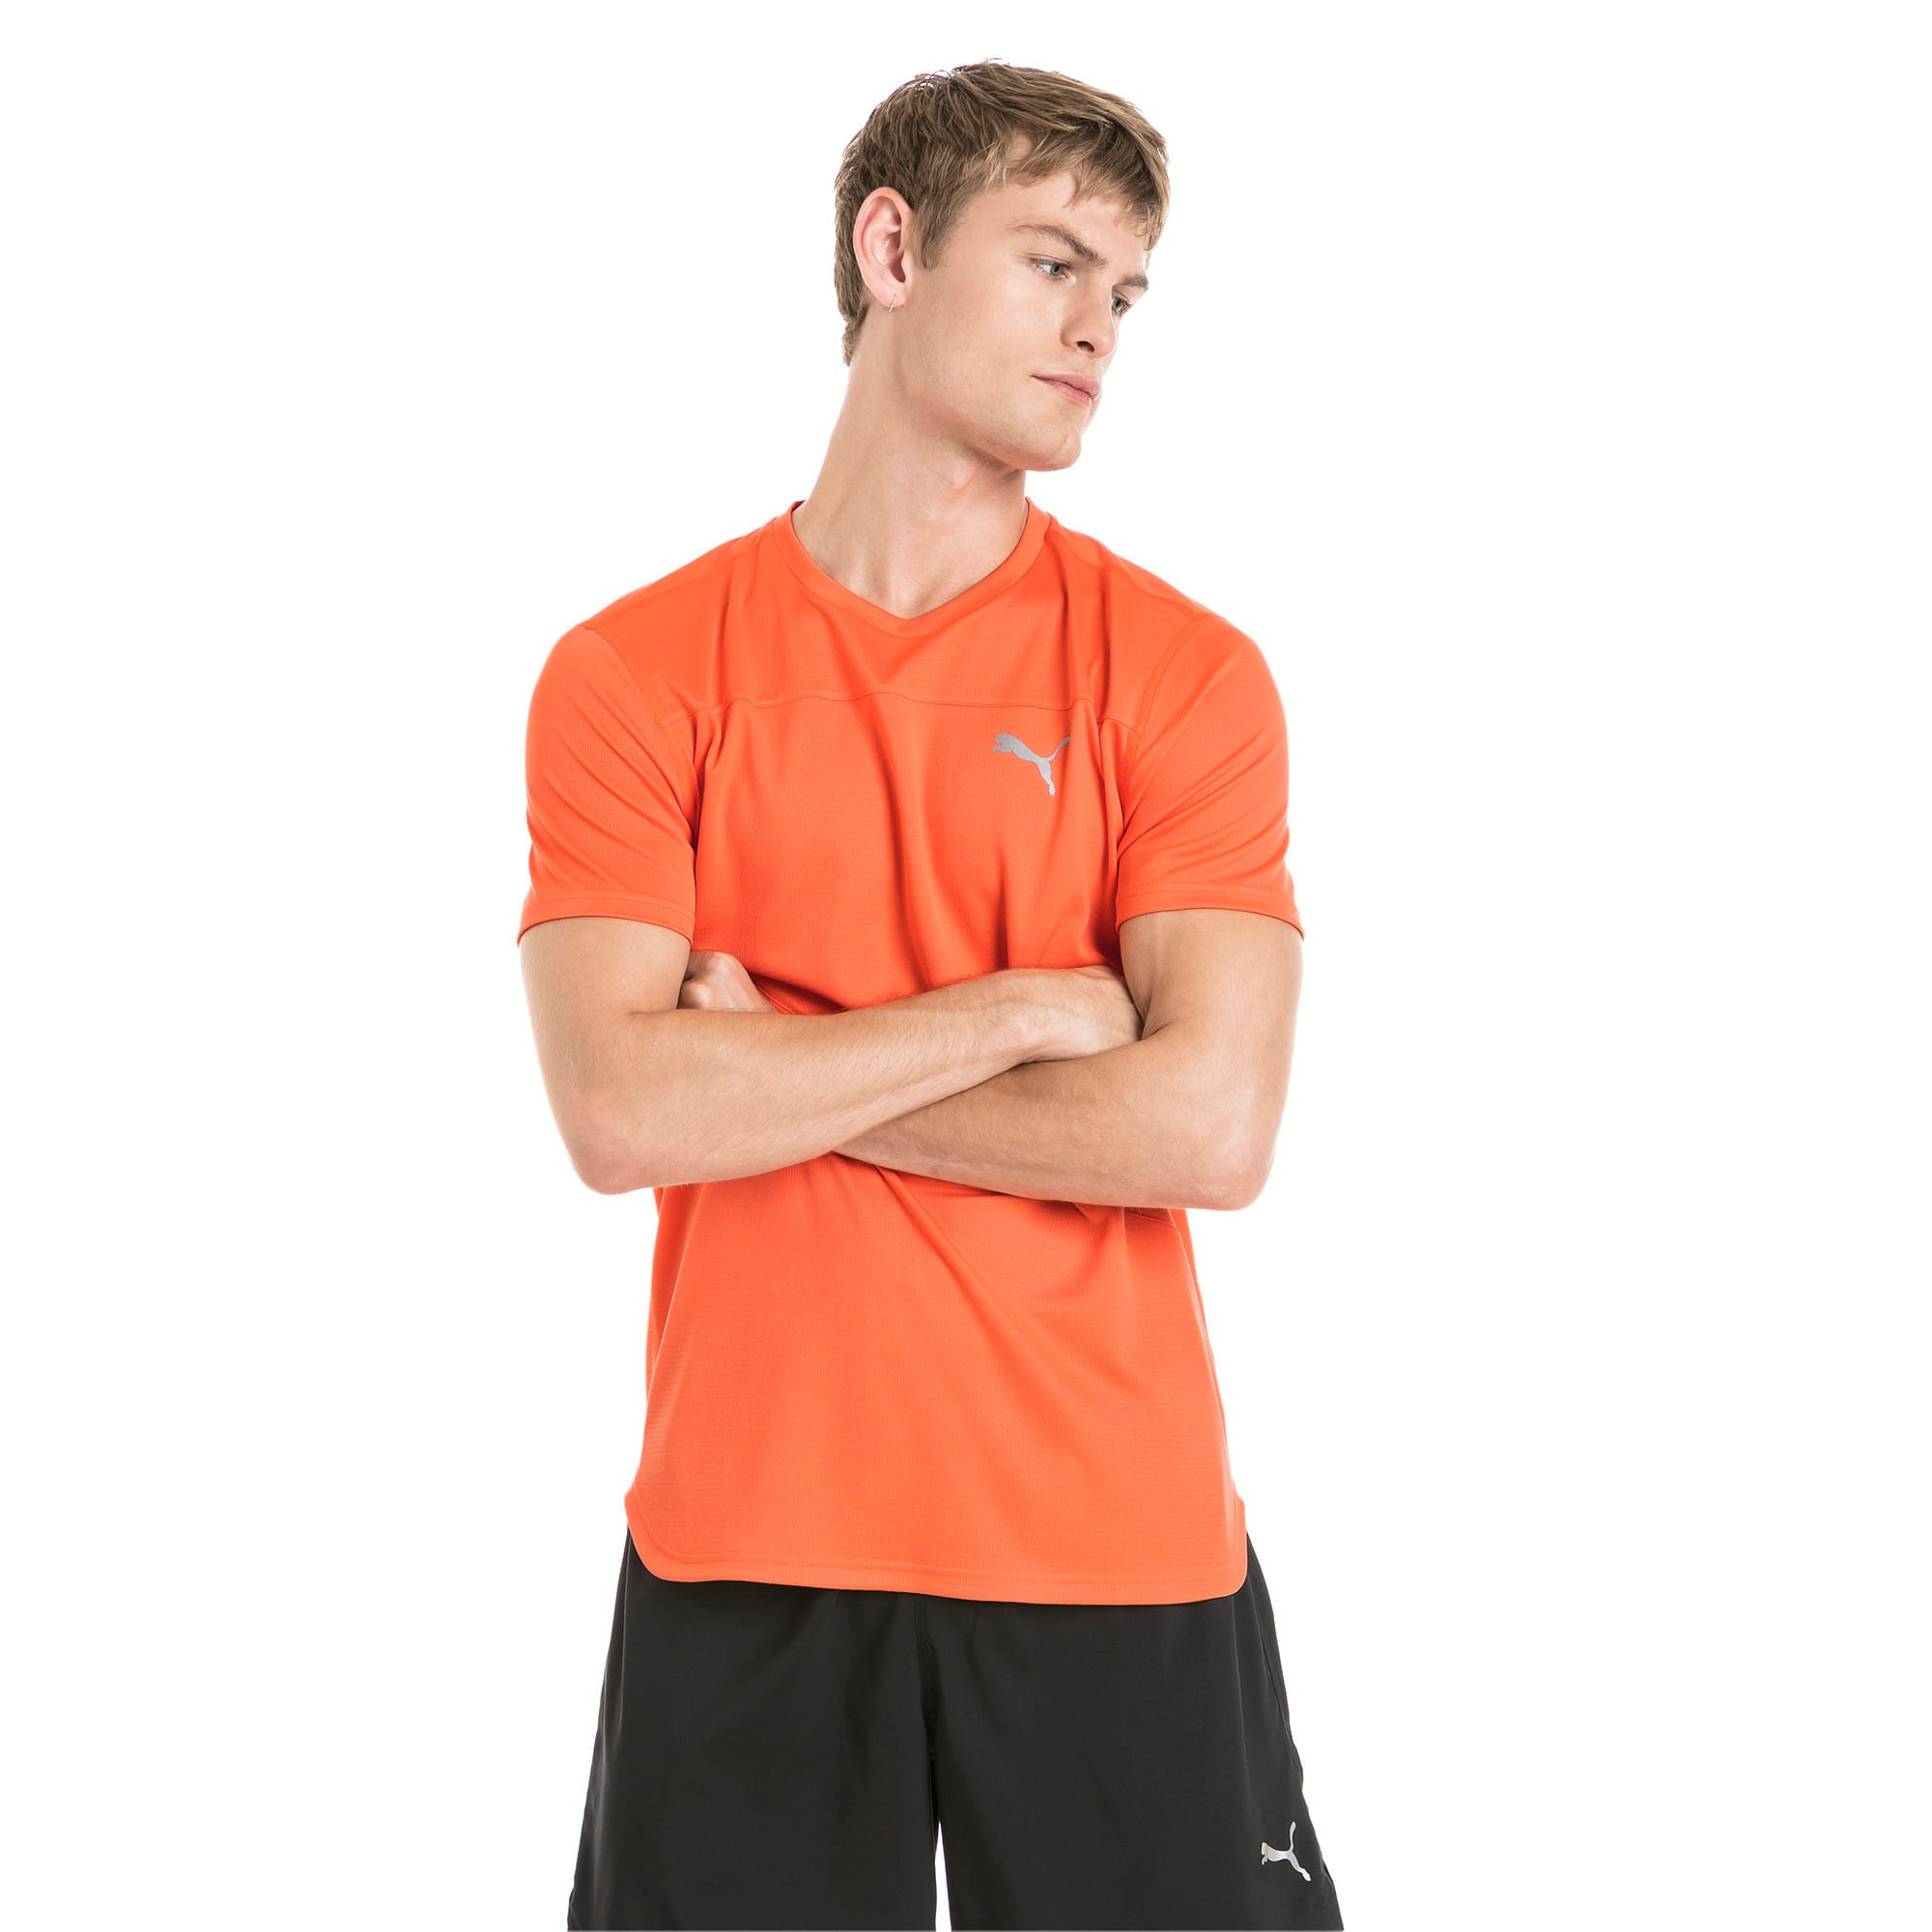 Thumbnail 1 of Running Men's IGNITE Mono T-Shirt, Firecracker, medium-IND